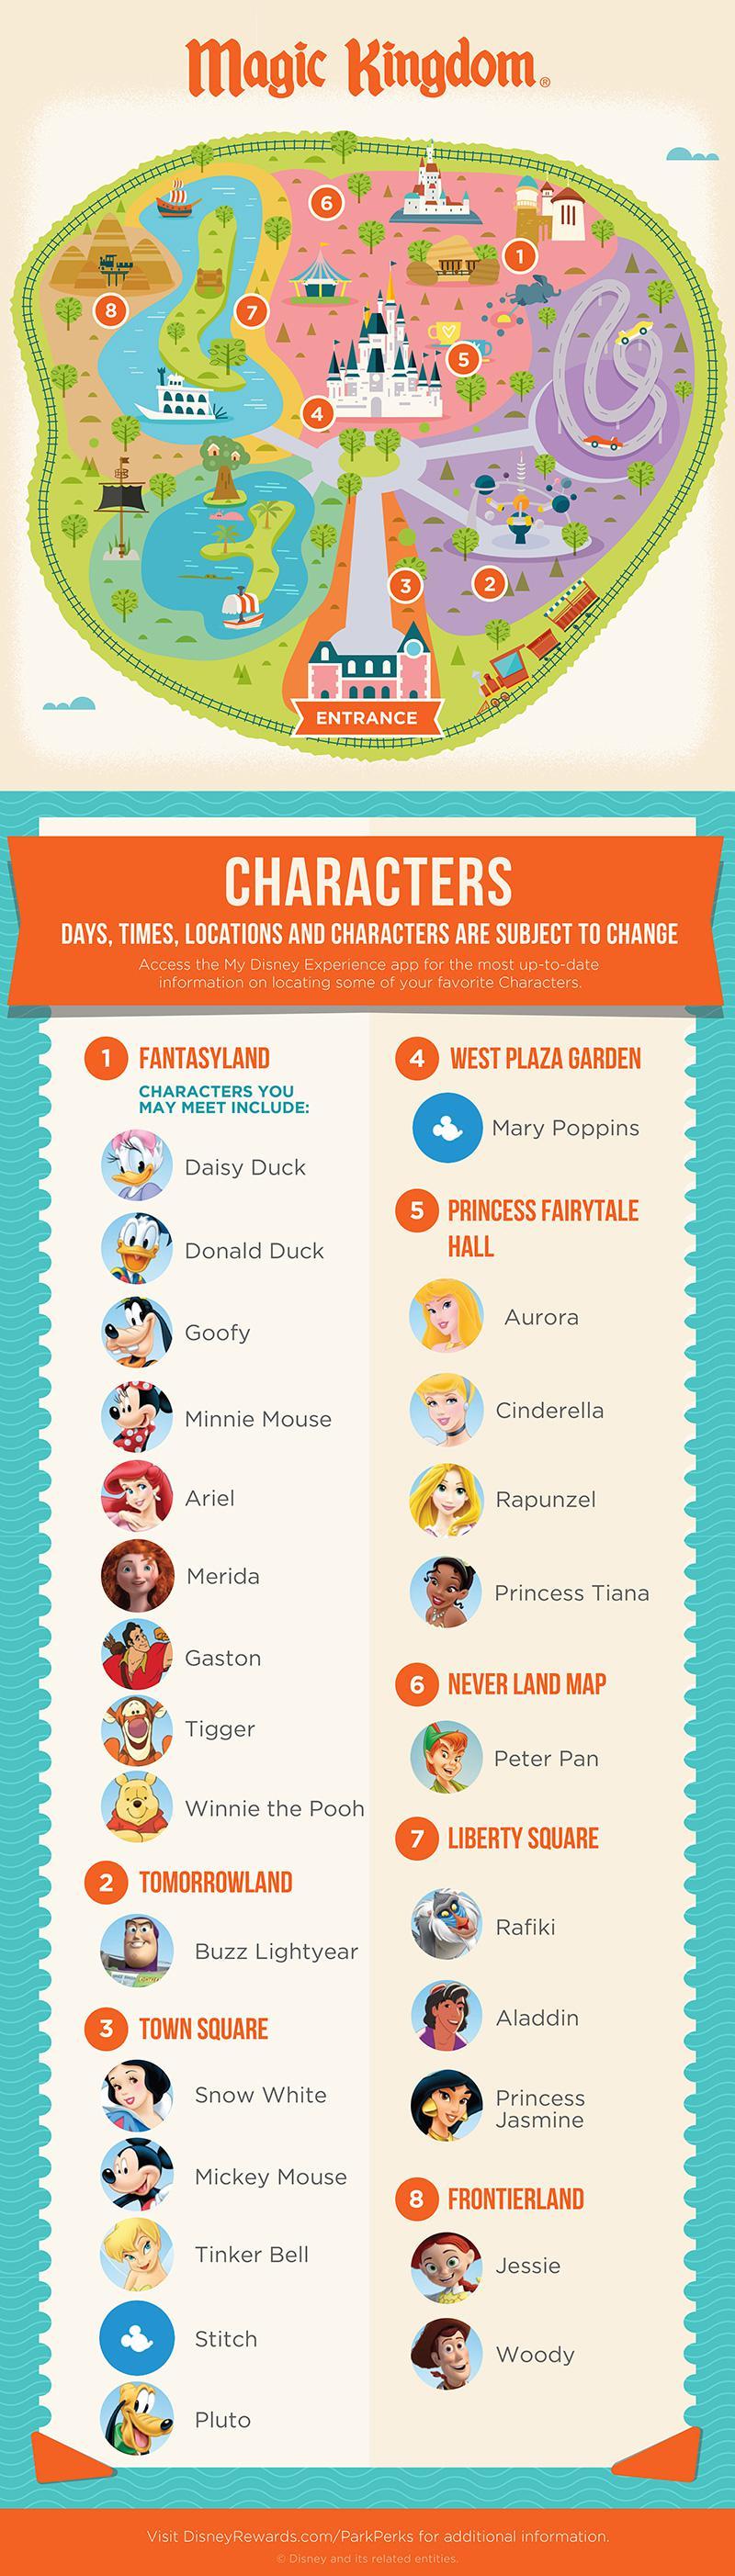 Disney Magic Kingdom Character Experience Map